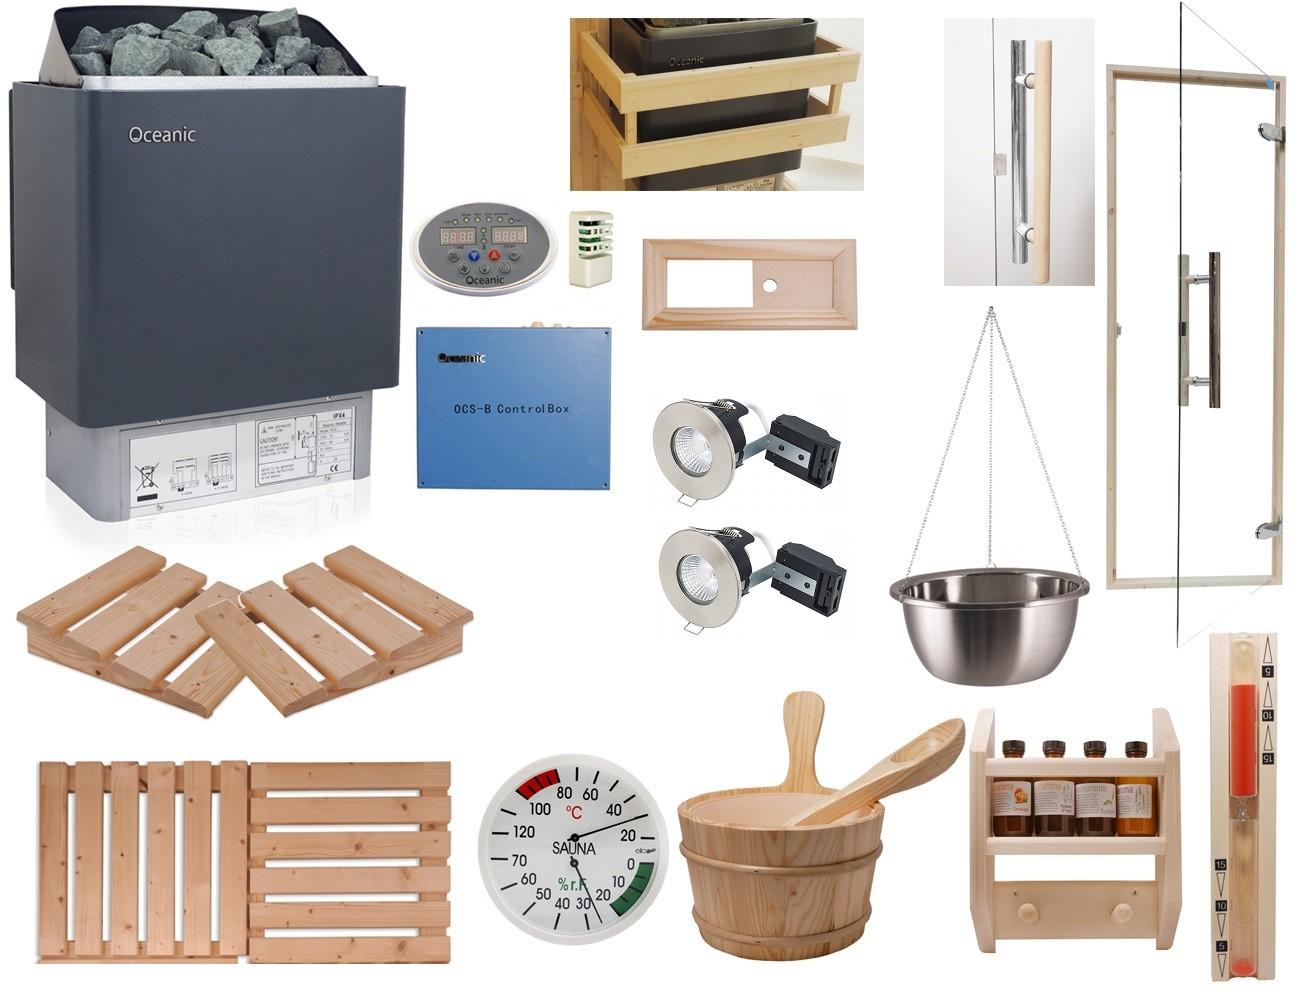 Celebration Home Sauna Kit with OCSB Controls